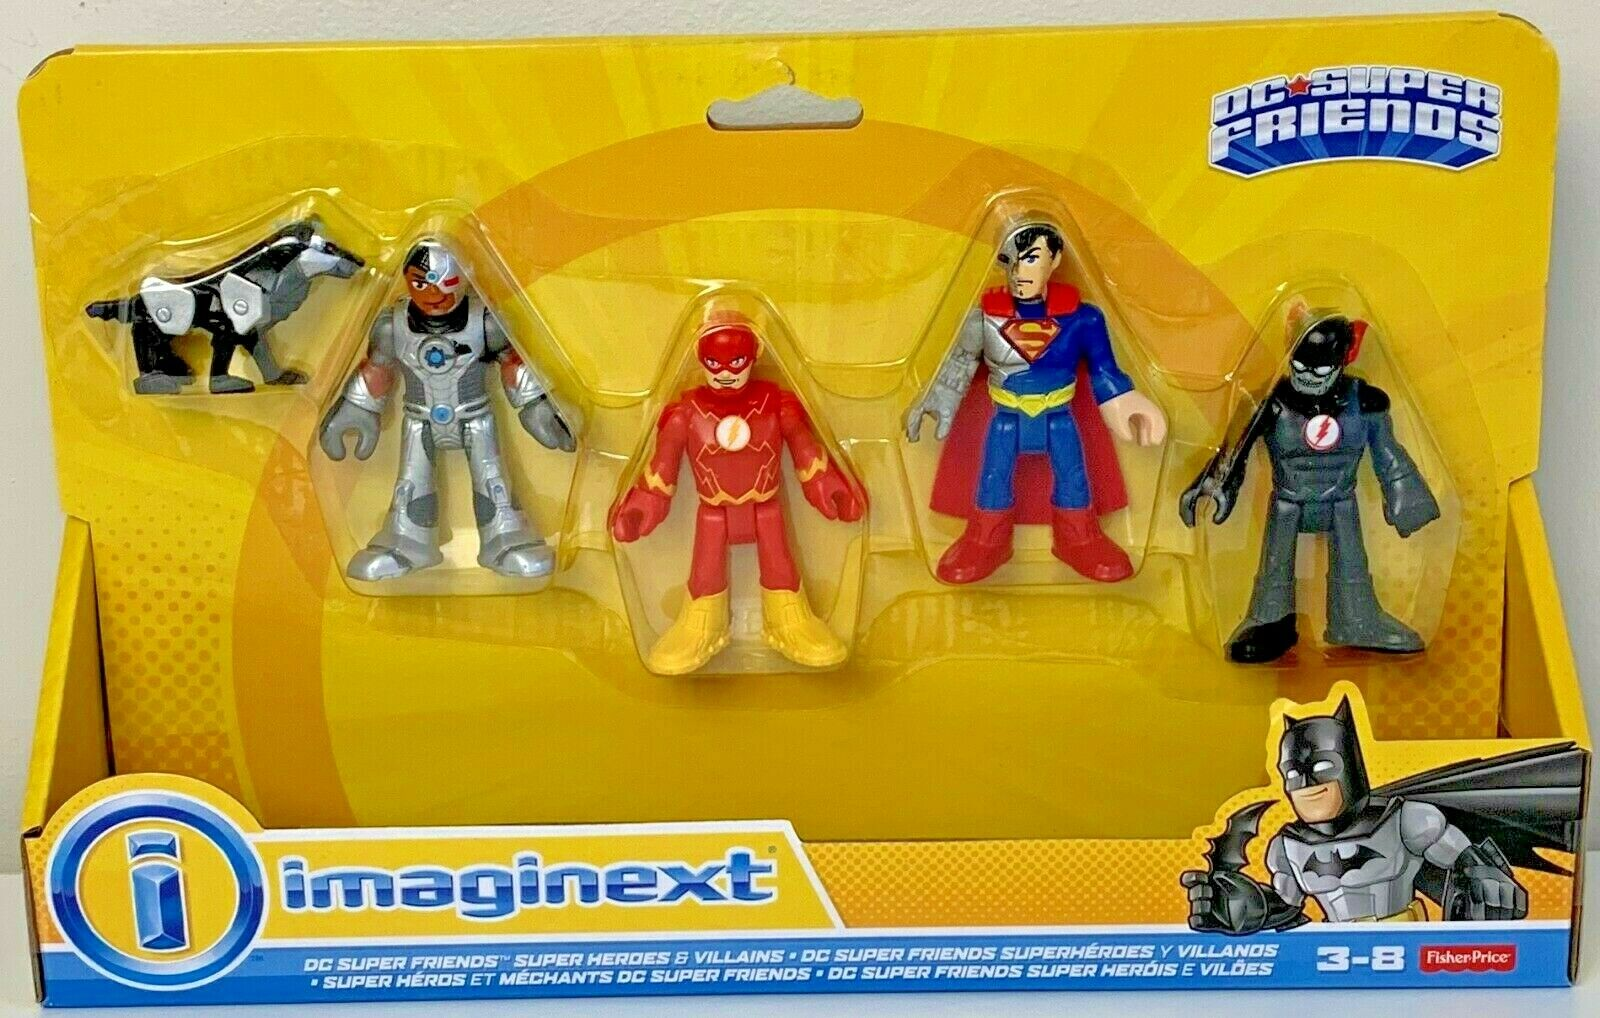 Kupit Fisher Price Imaginext Dc Super Friends Super Heroes Na Ebay Com Iz Ameriki S Dostavkoj V Rossiyu Ukrainu Kazahstan